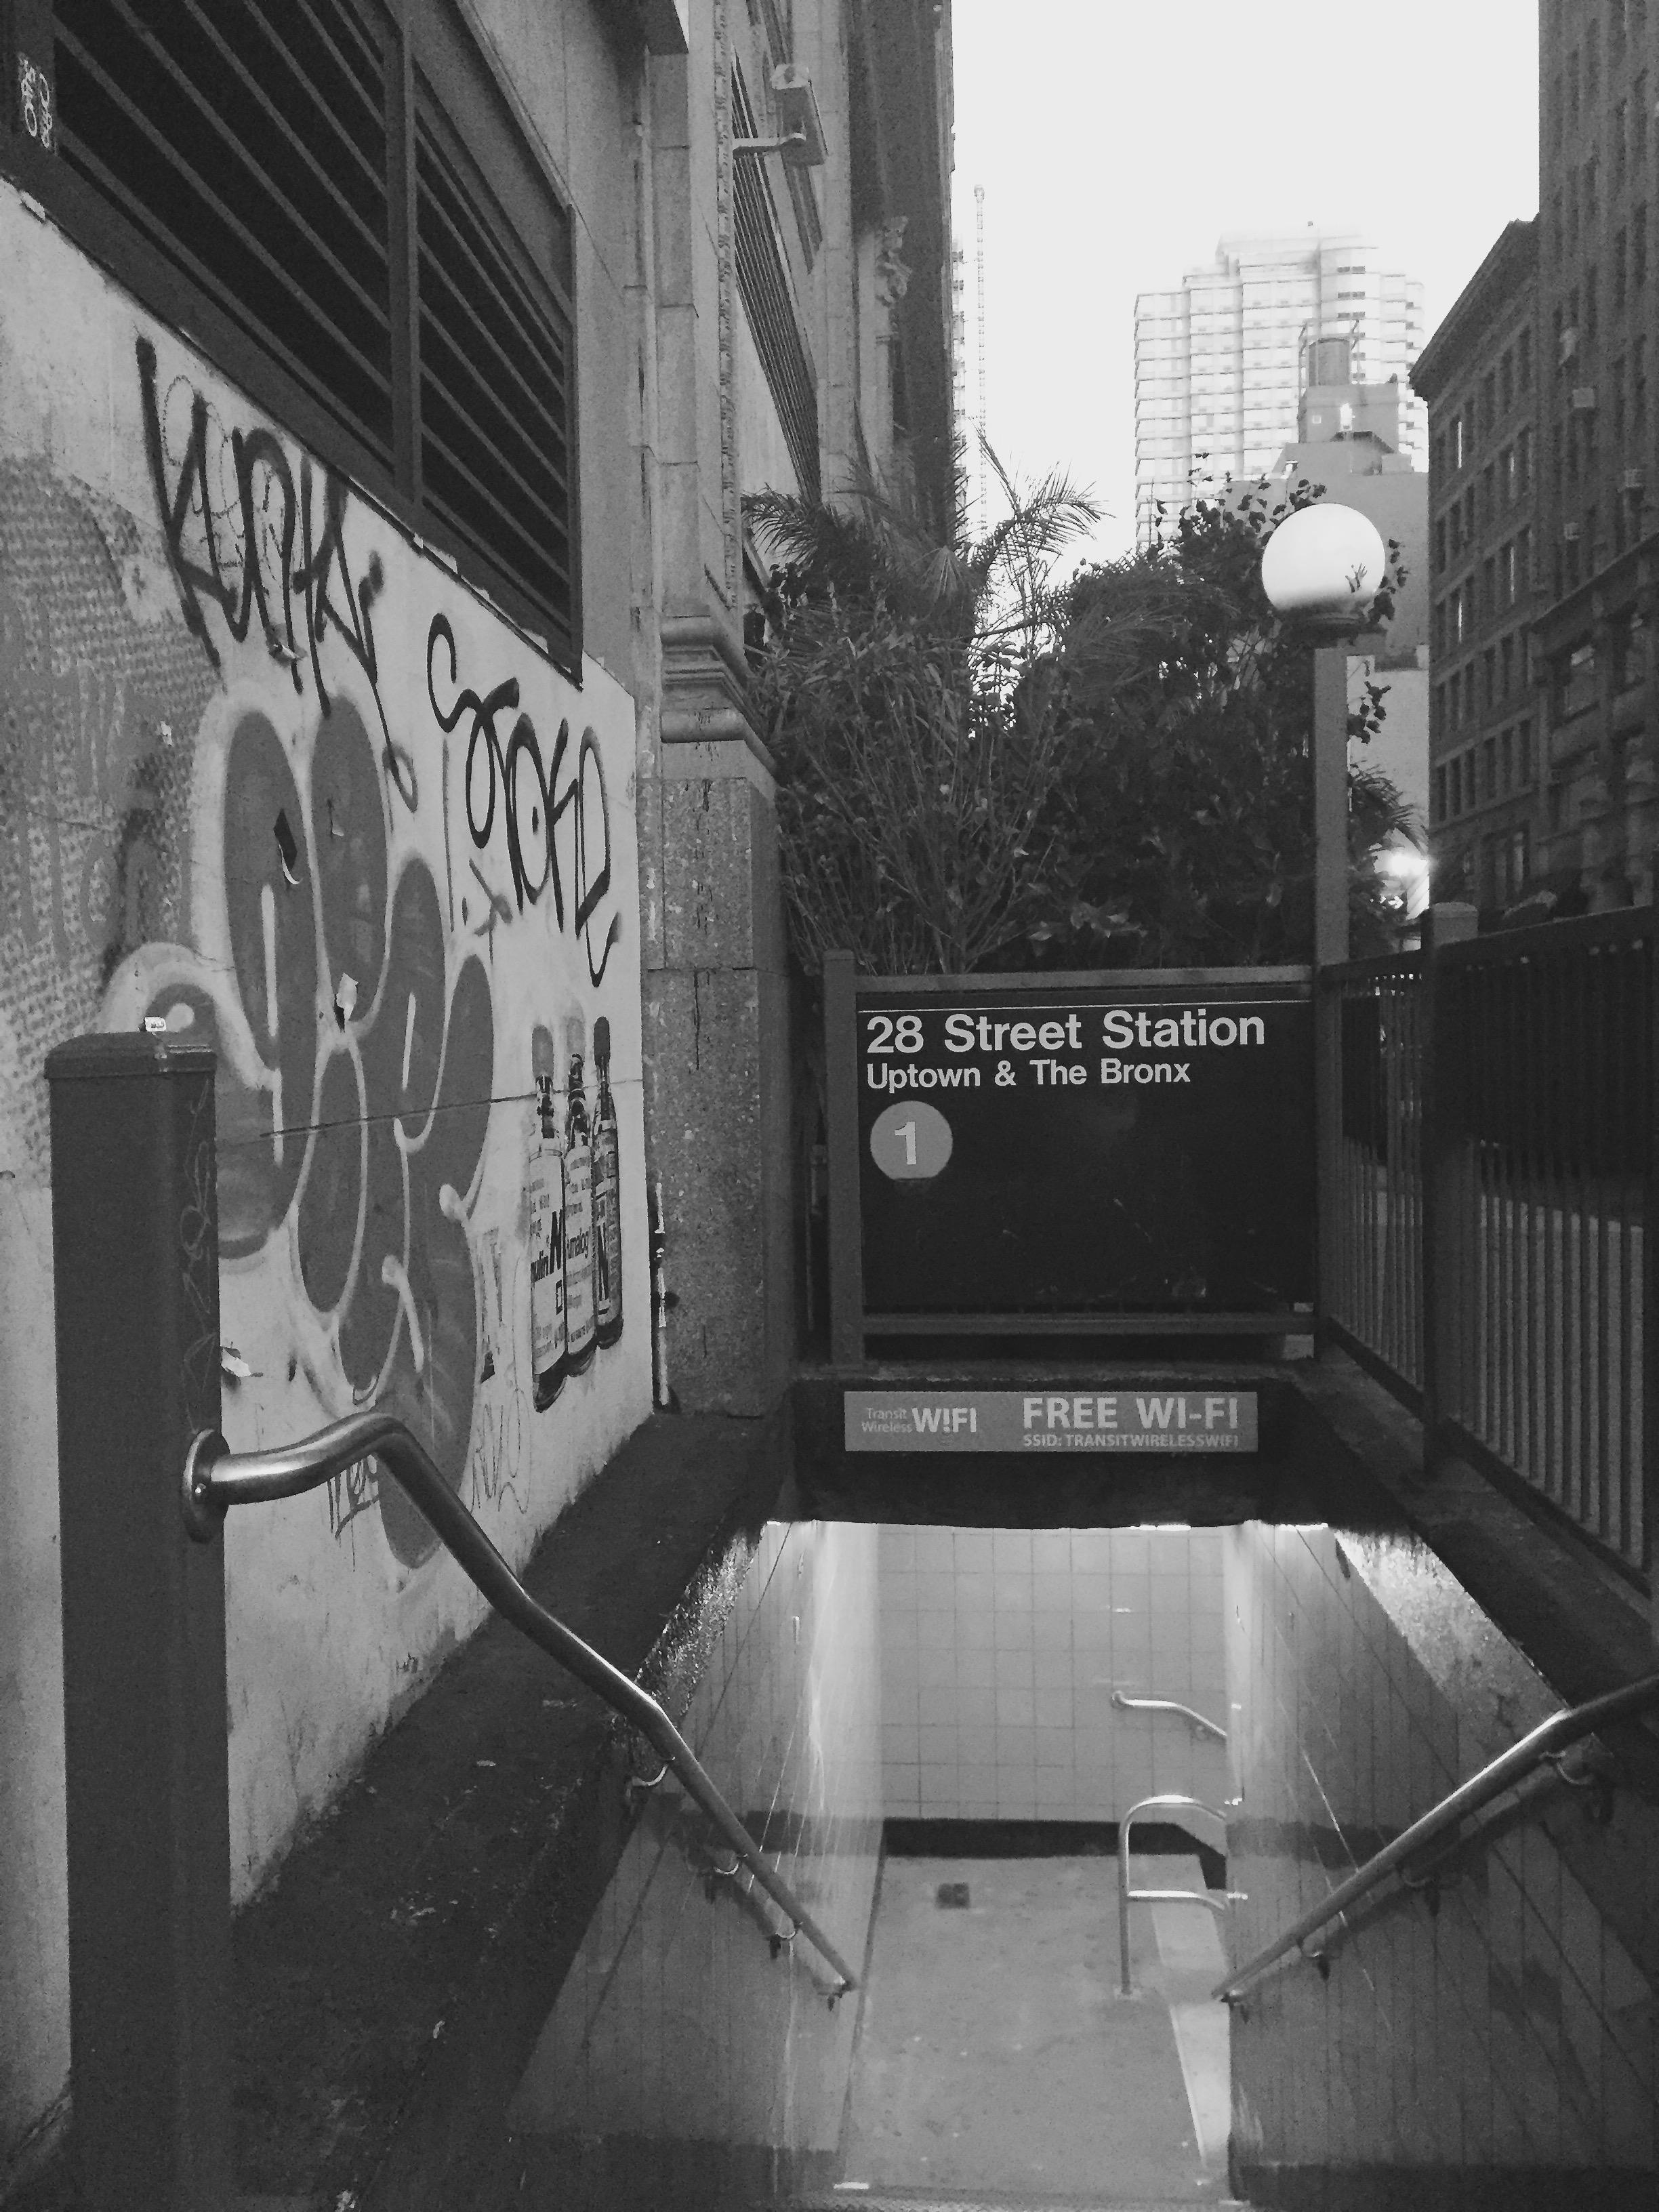 Uptown & The Bronx